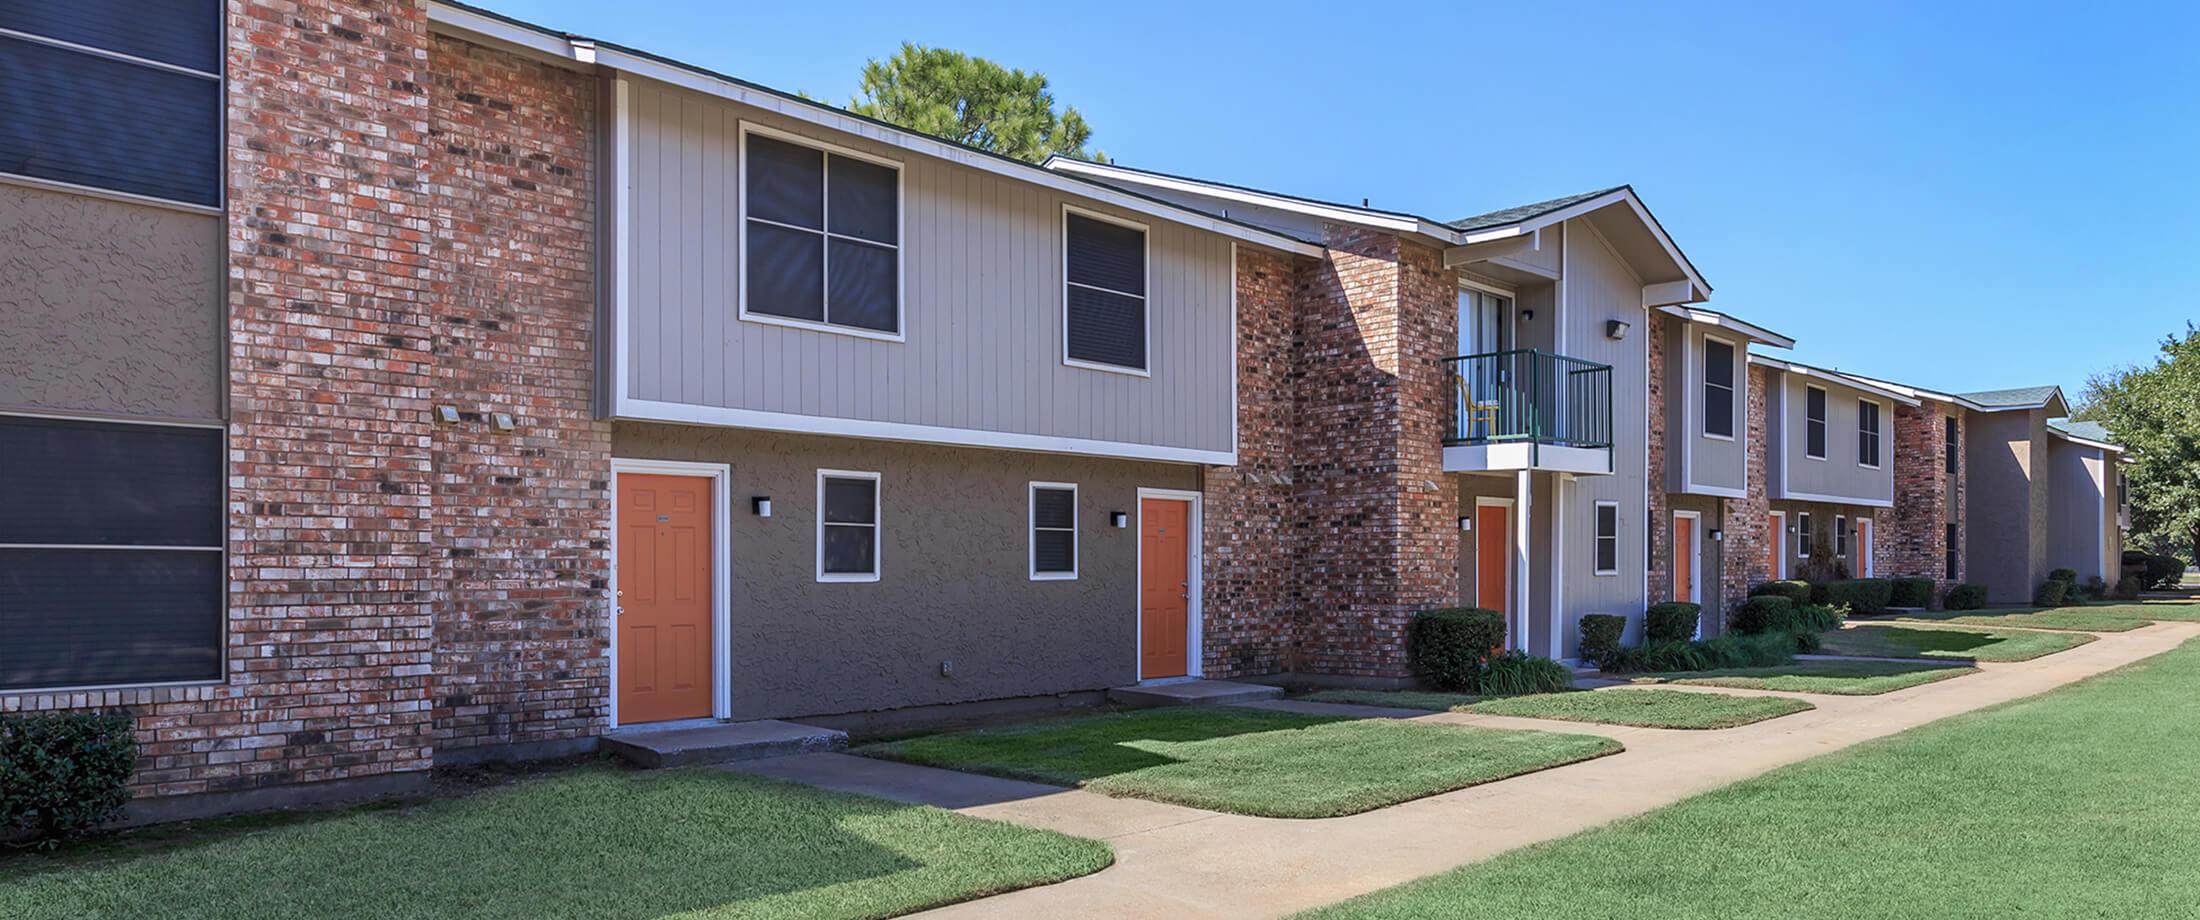 Waterford Glen Apartments Wichita Falls Tx